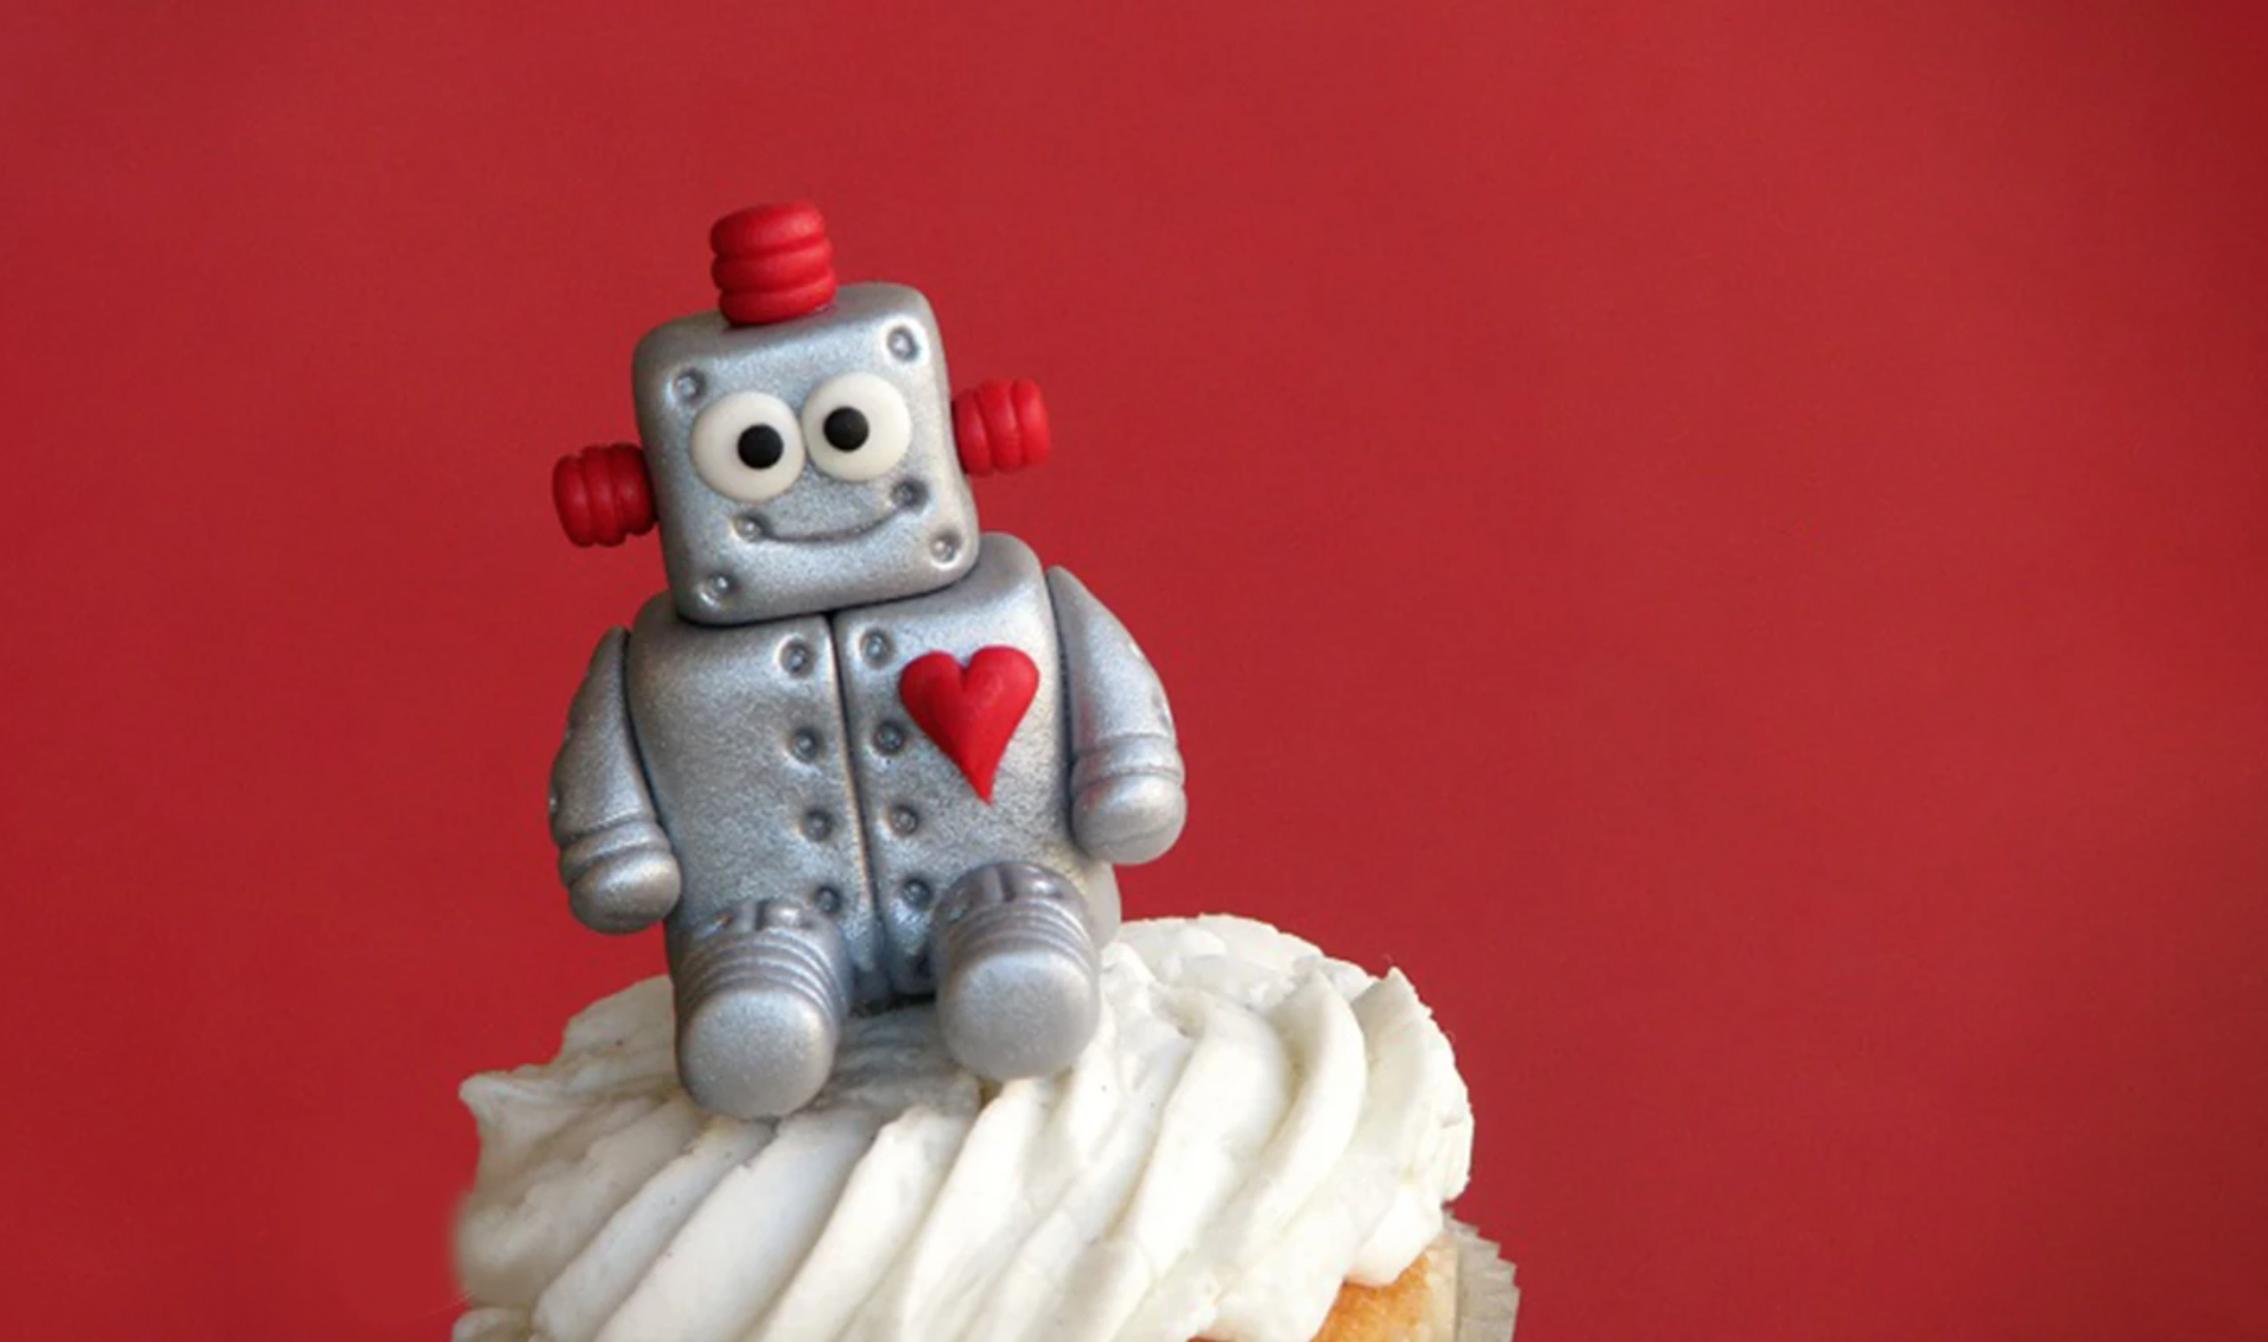 fondant love robot